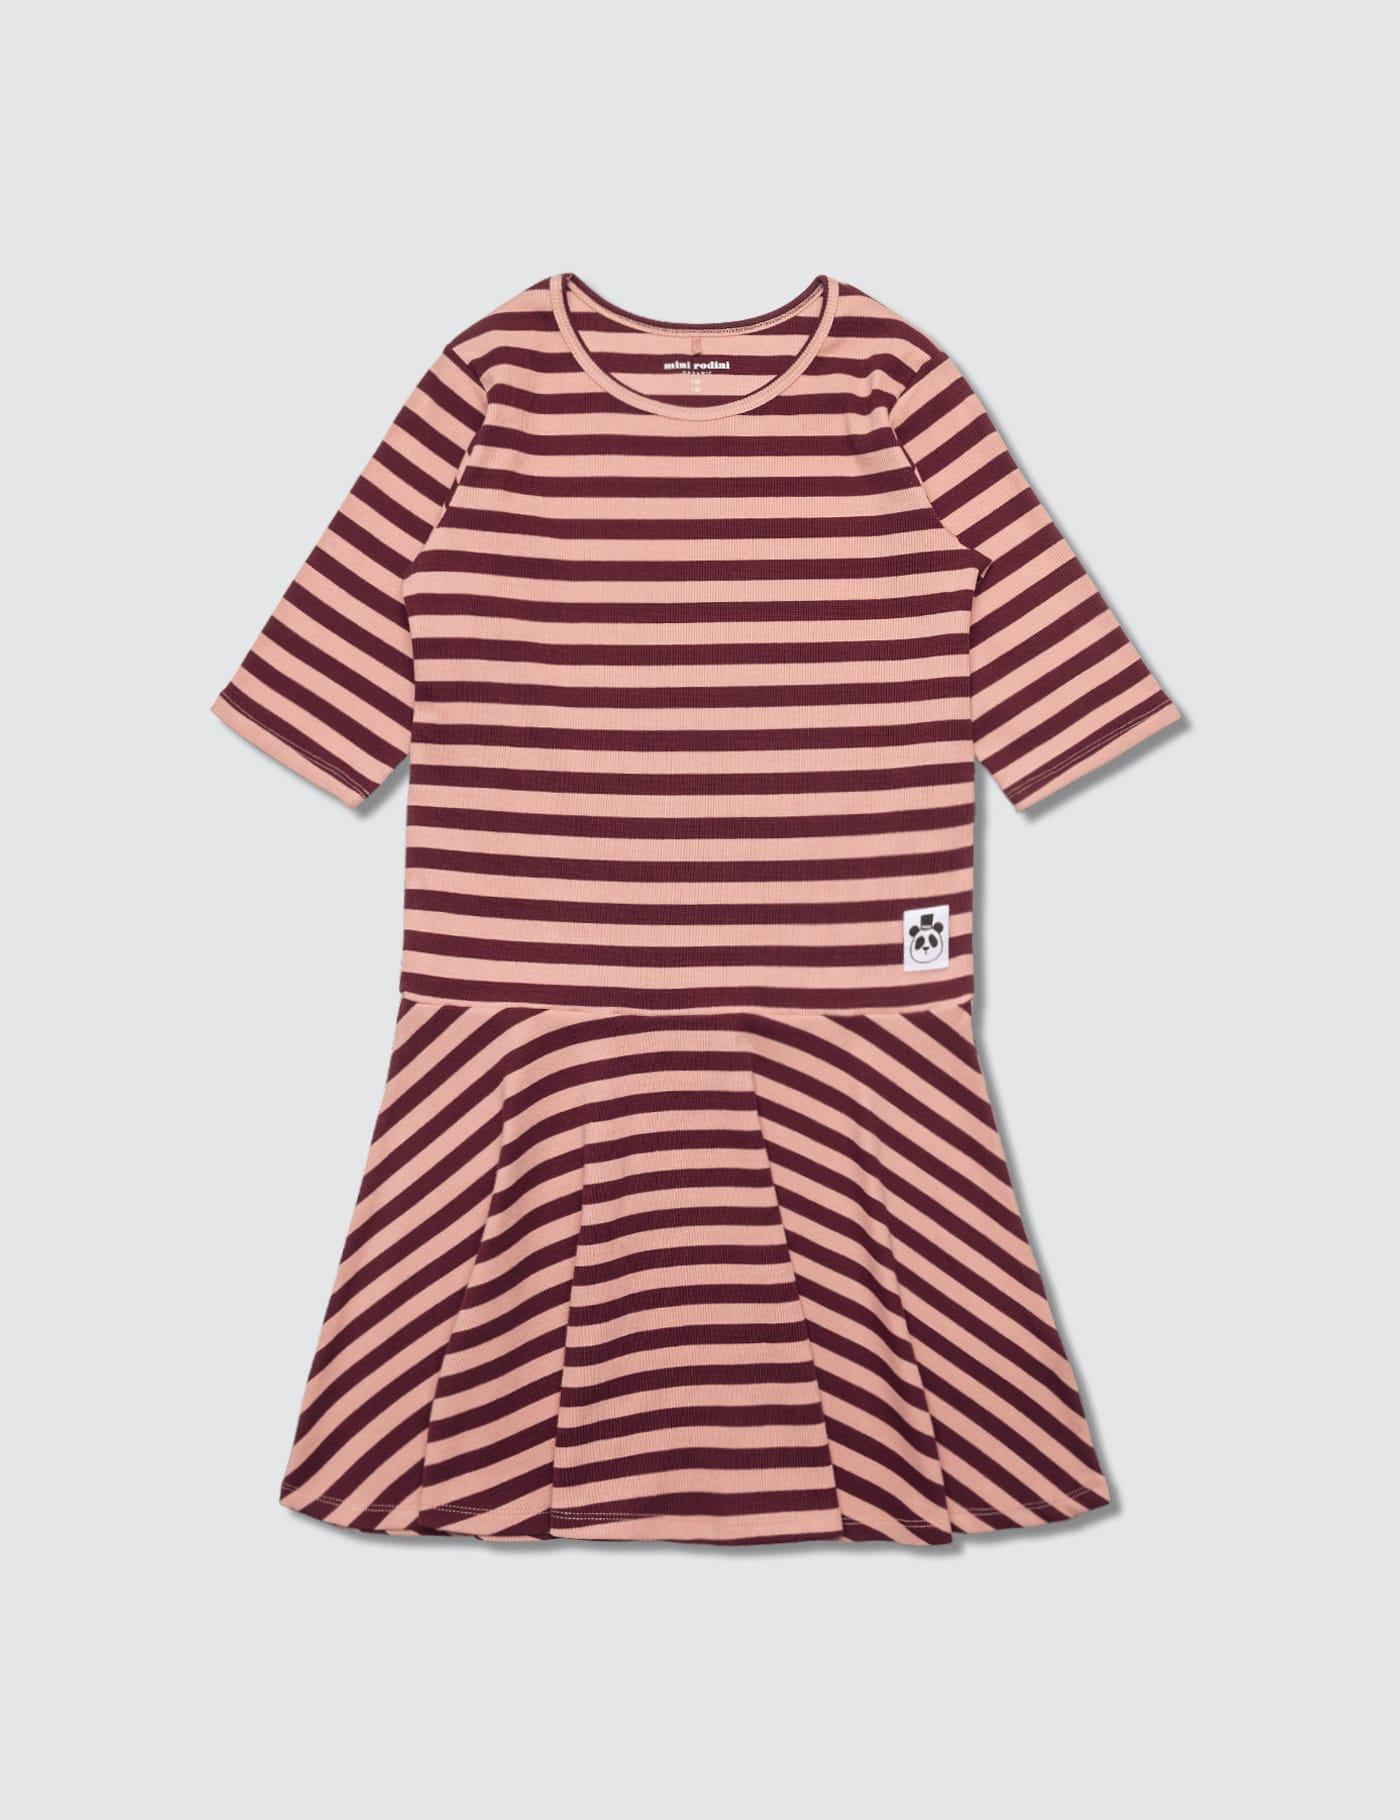 Stripe Rib Dance Dress